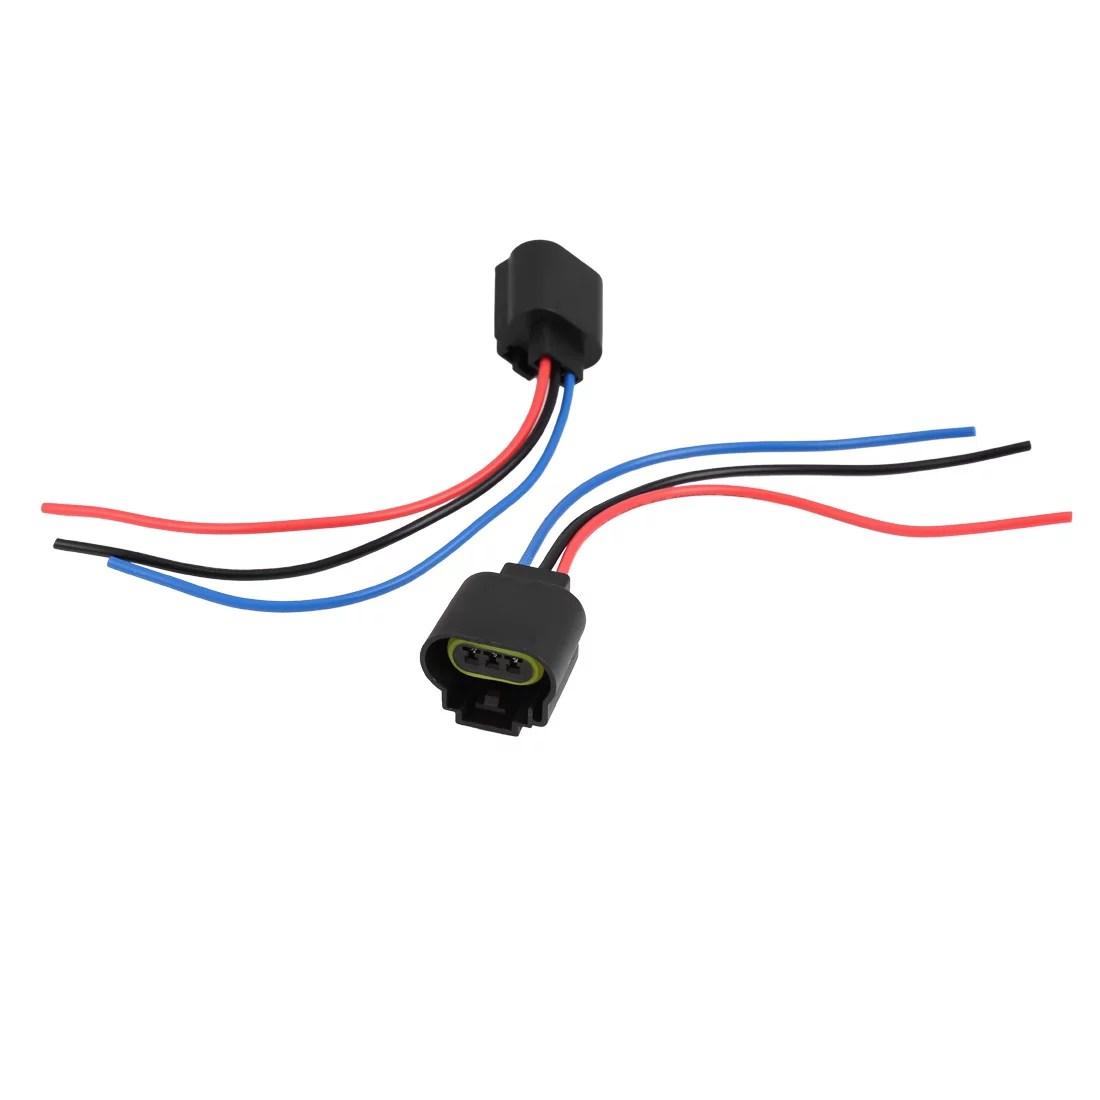 hight resolution of 2pcs 12v 3 9w h13 9008 3 wire harness headlight fog light bulb sockets for car